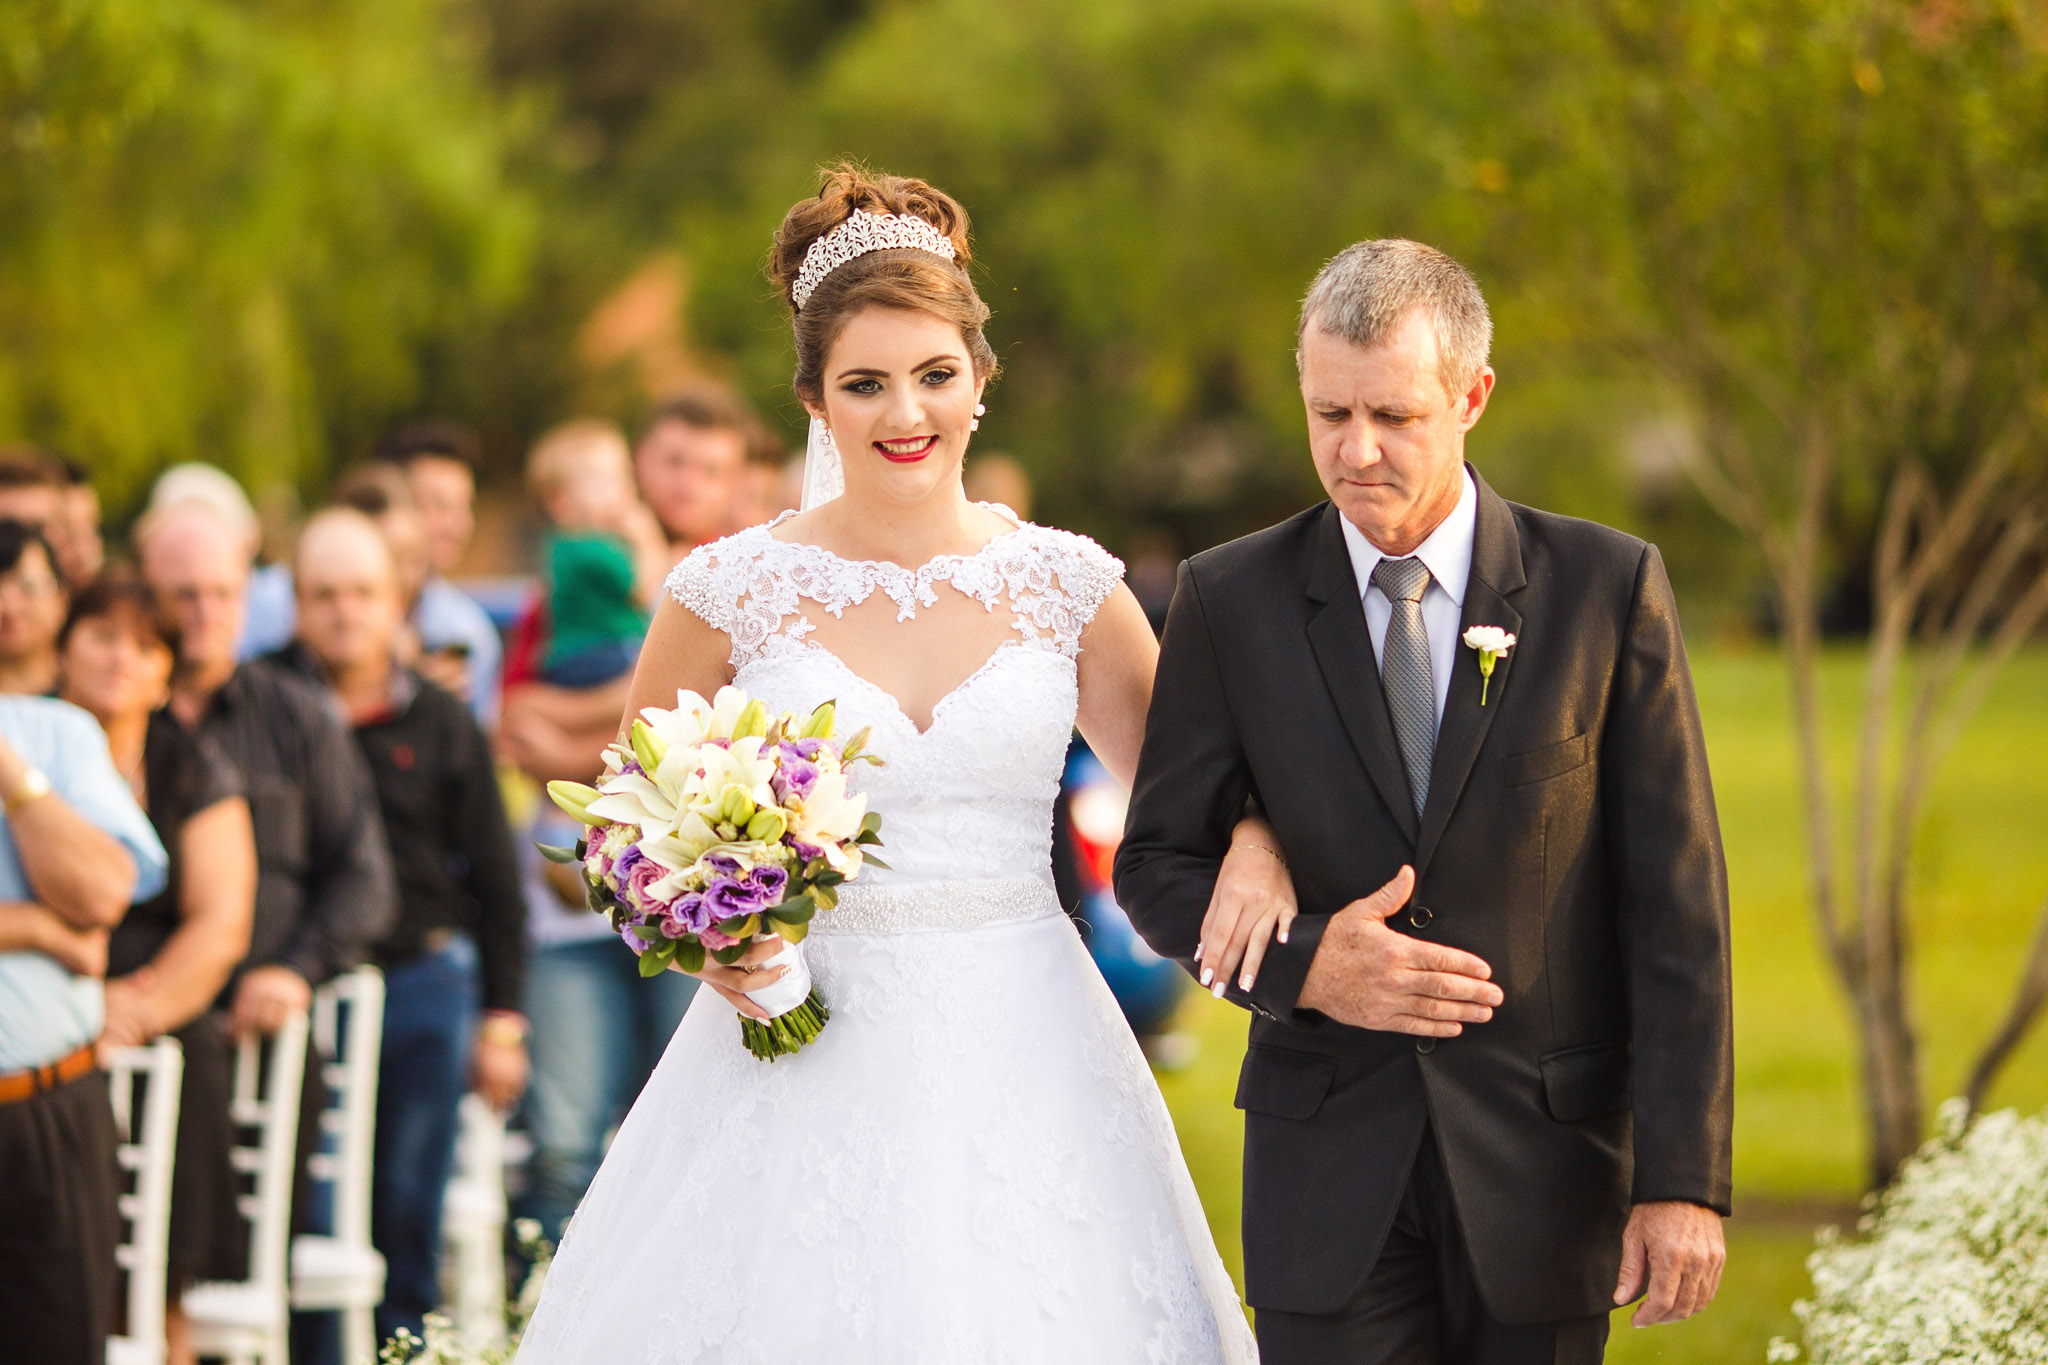 Wedding_Travellers_Destination_Wedding_Photography-65.jpg